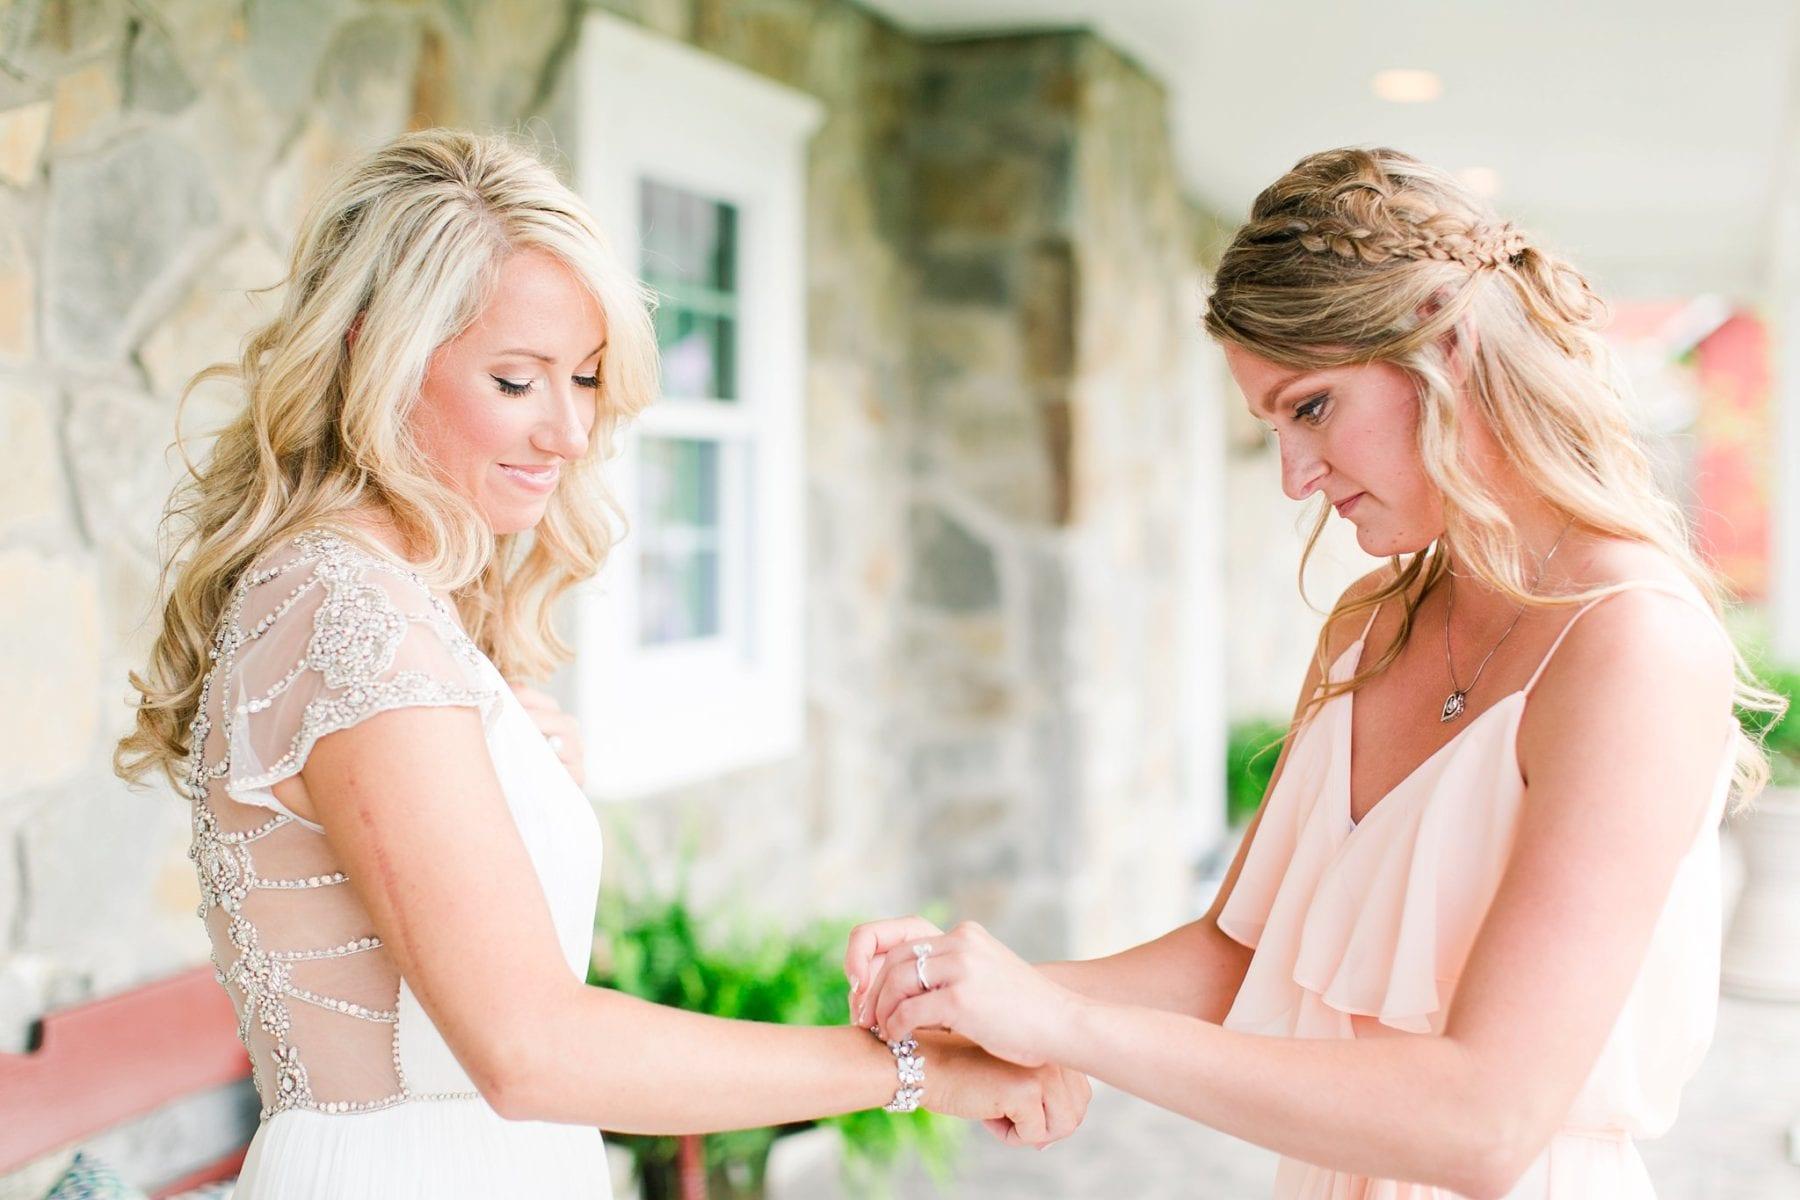 Pond View Farm Wedding Photos Maryland Wedding Photographer Kristen & Ryan Megan Kelsey Photography Blog-53.jpg